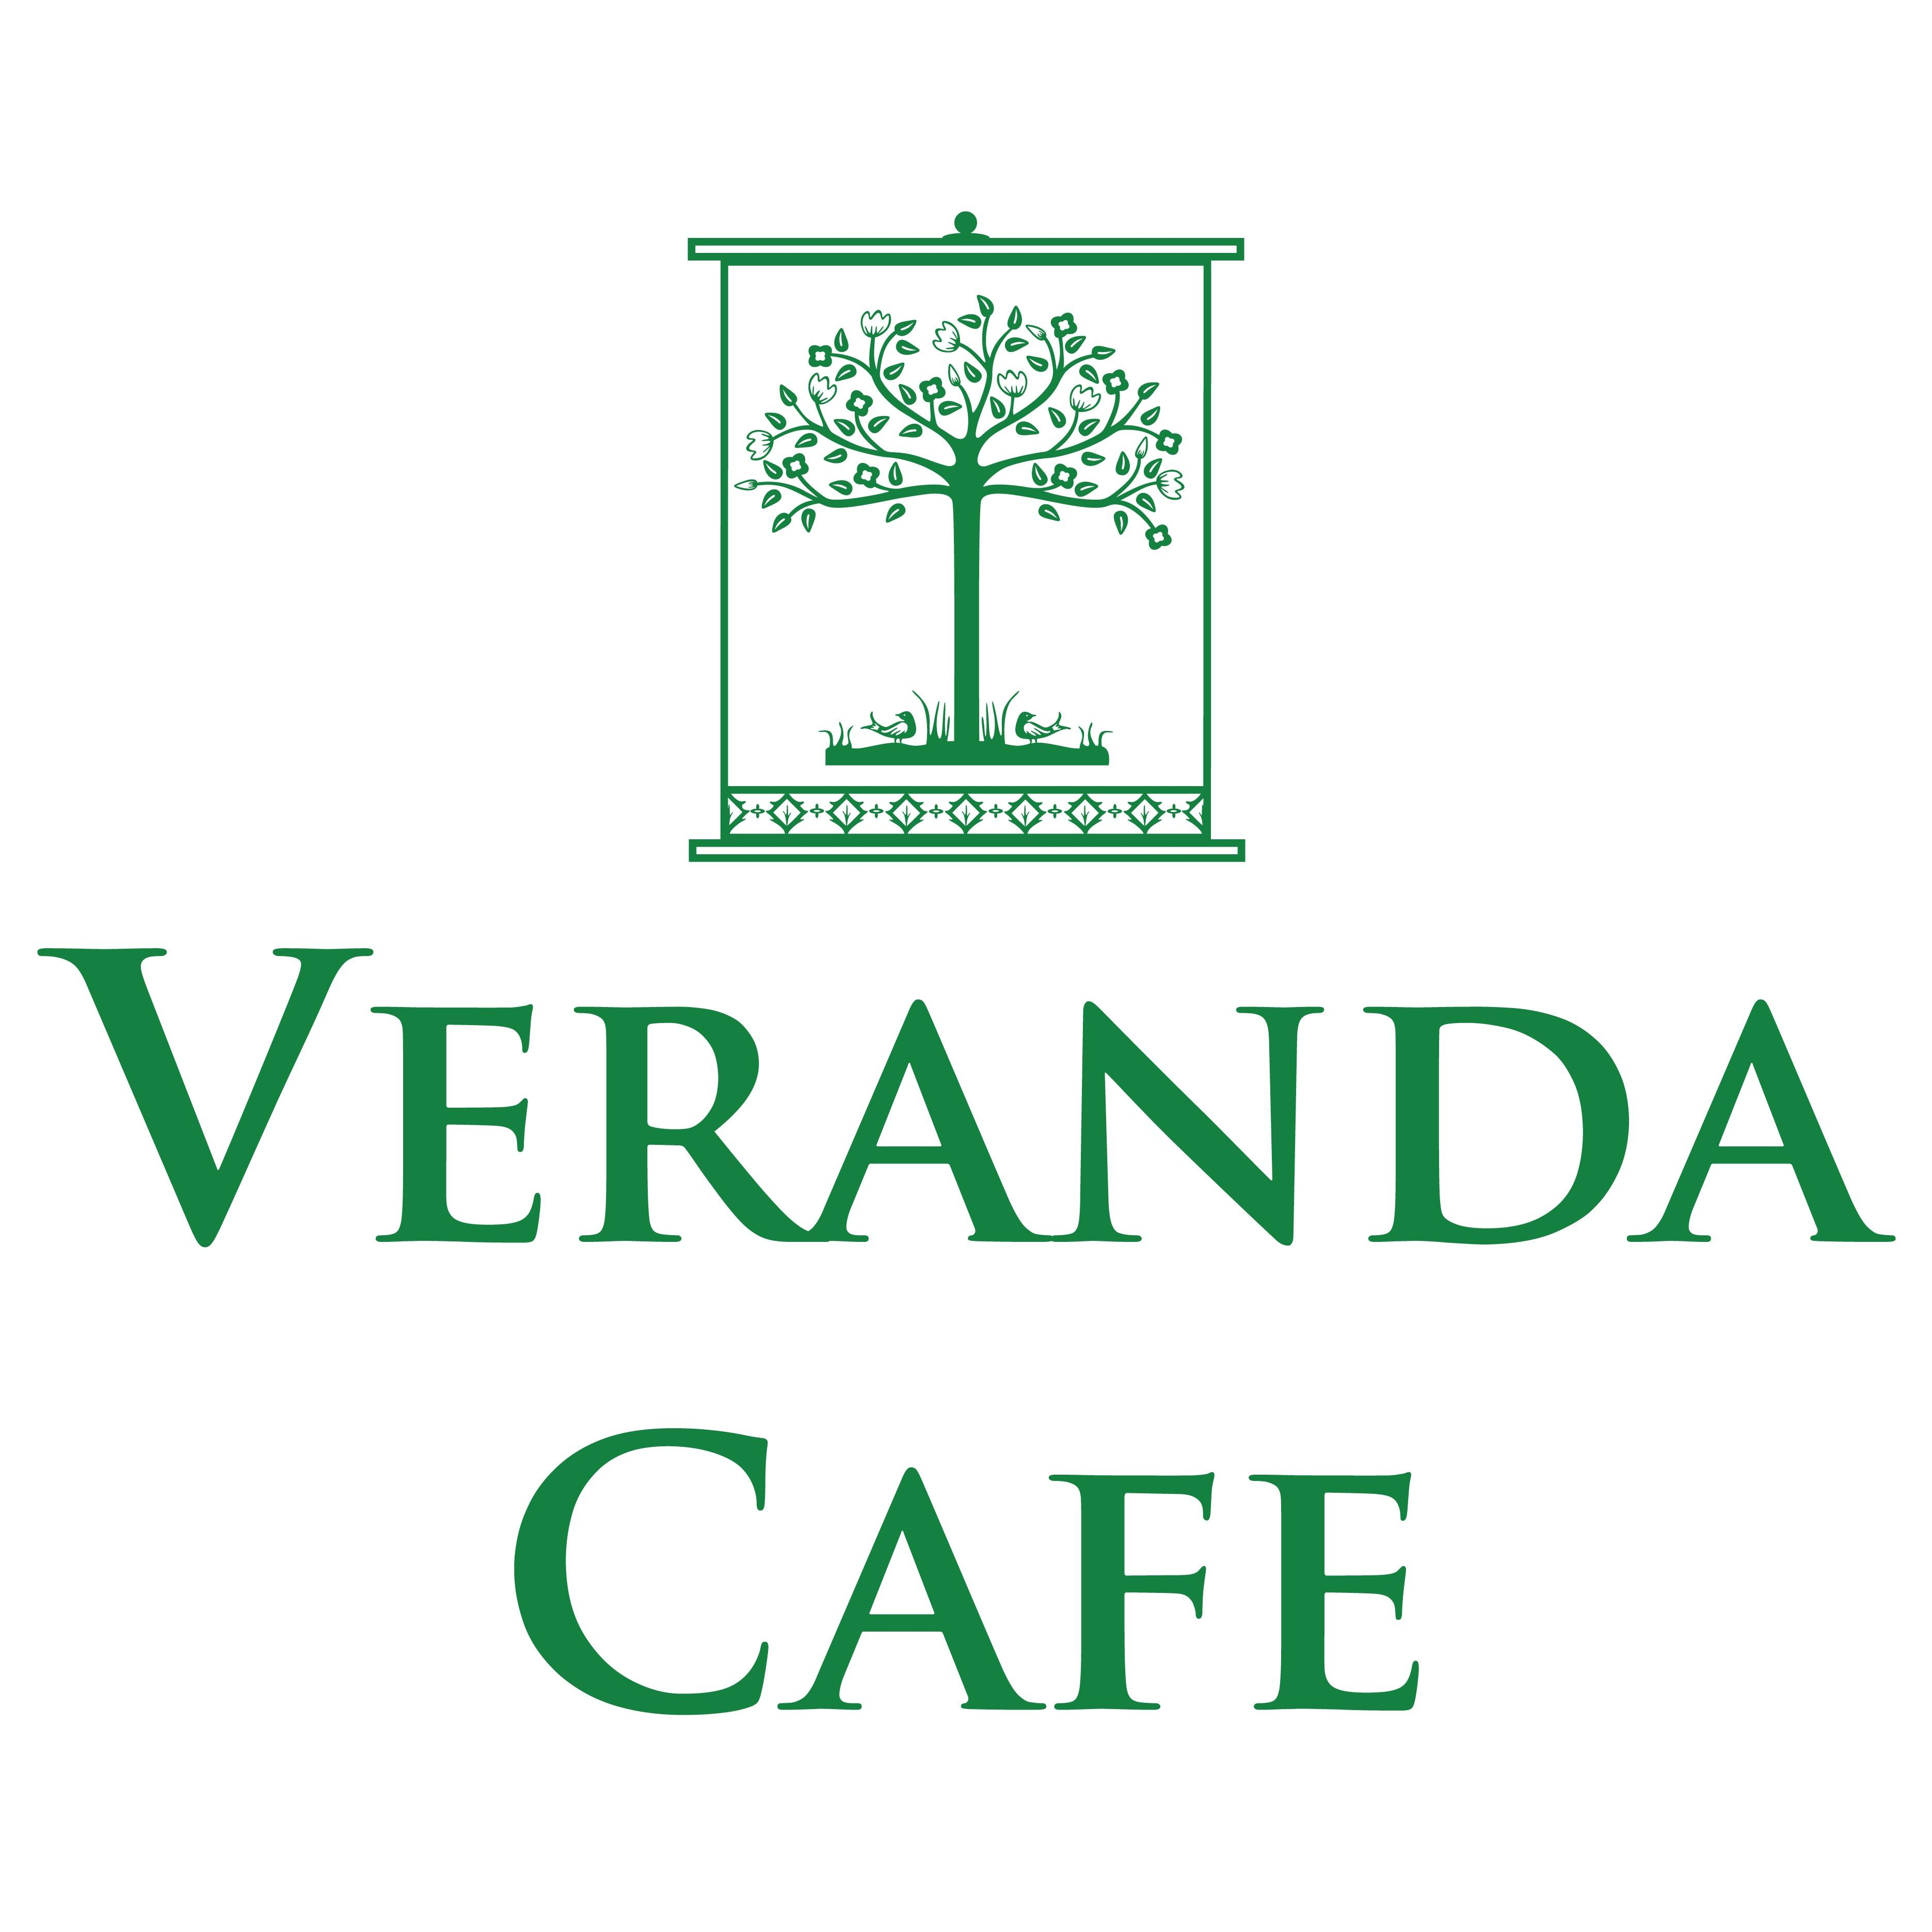 Veranda Cafe & Gift